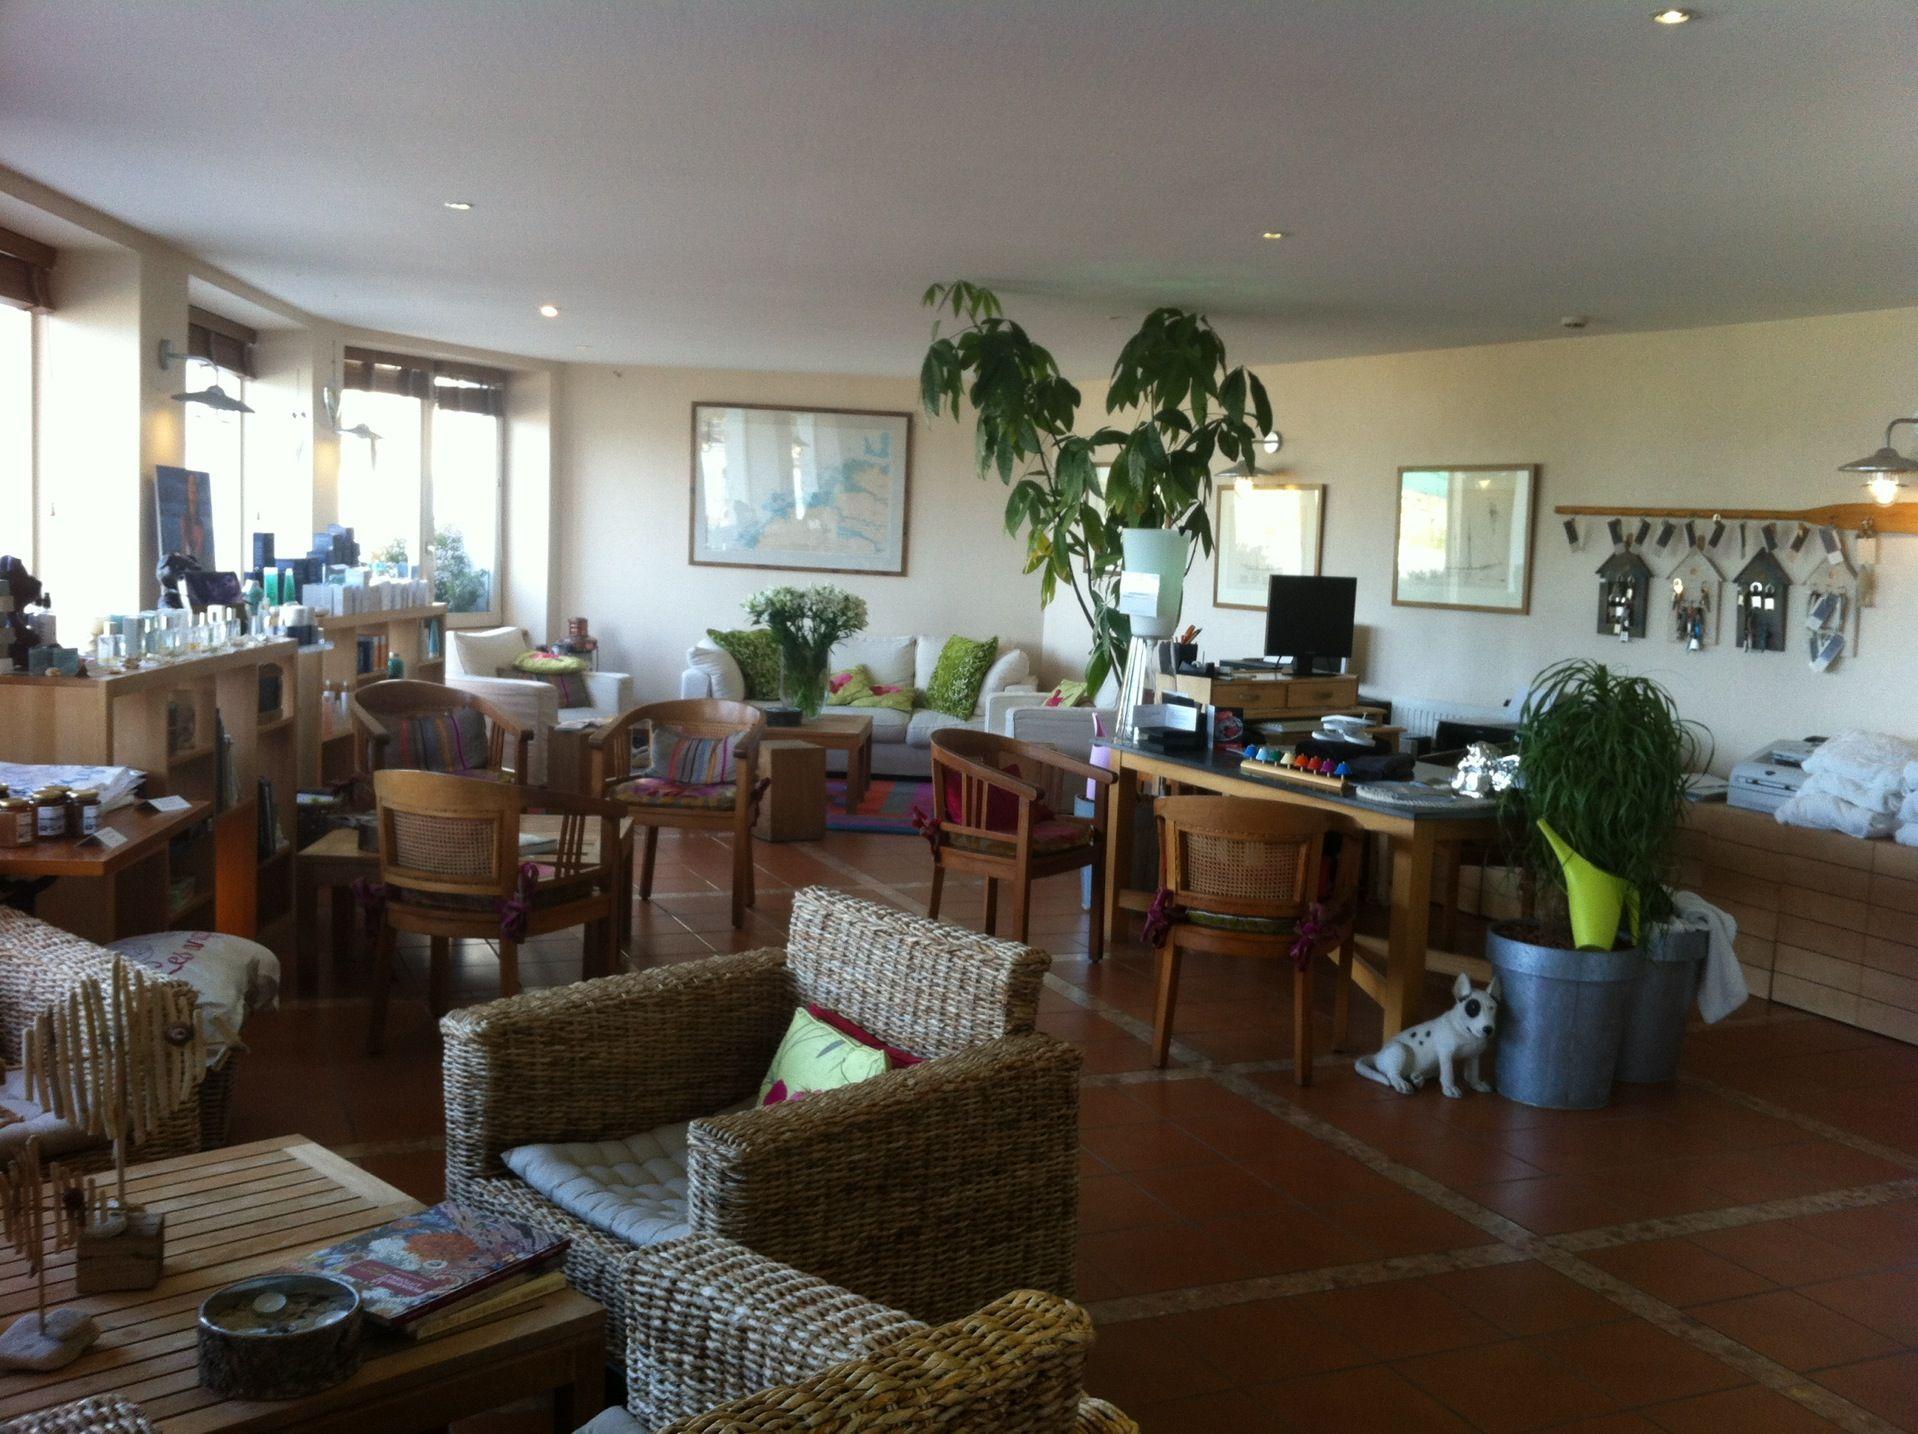 La Baie Des Anges Hotel Landeda à Landéda, Bretagne